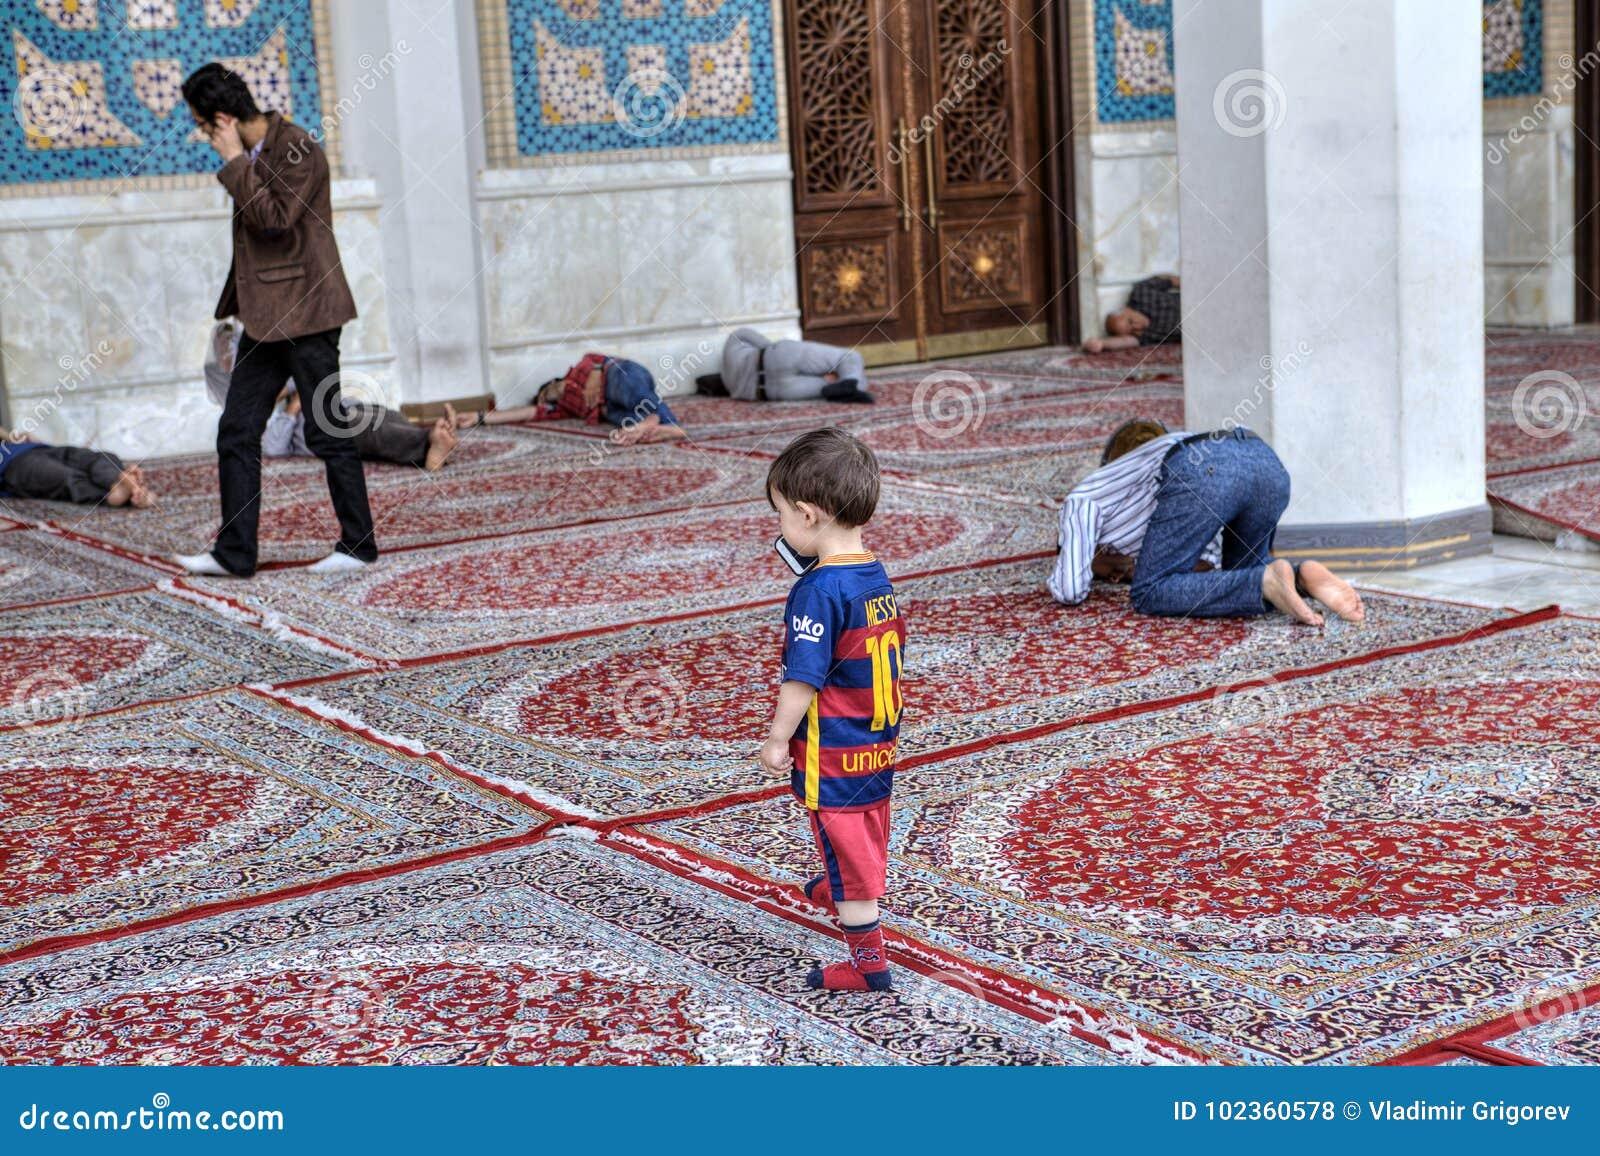 La cour de la mosquée iranienne, musulmans prient, dormant, promenade, Shira